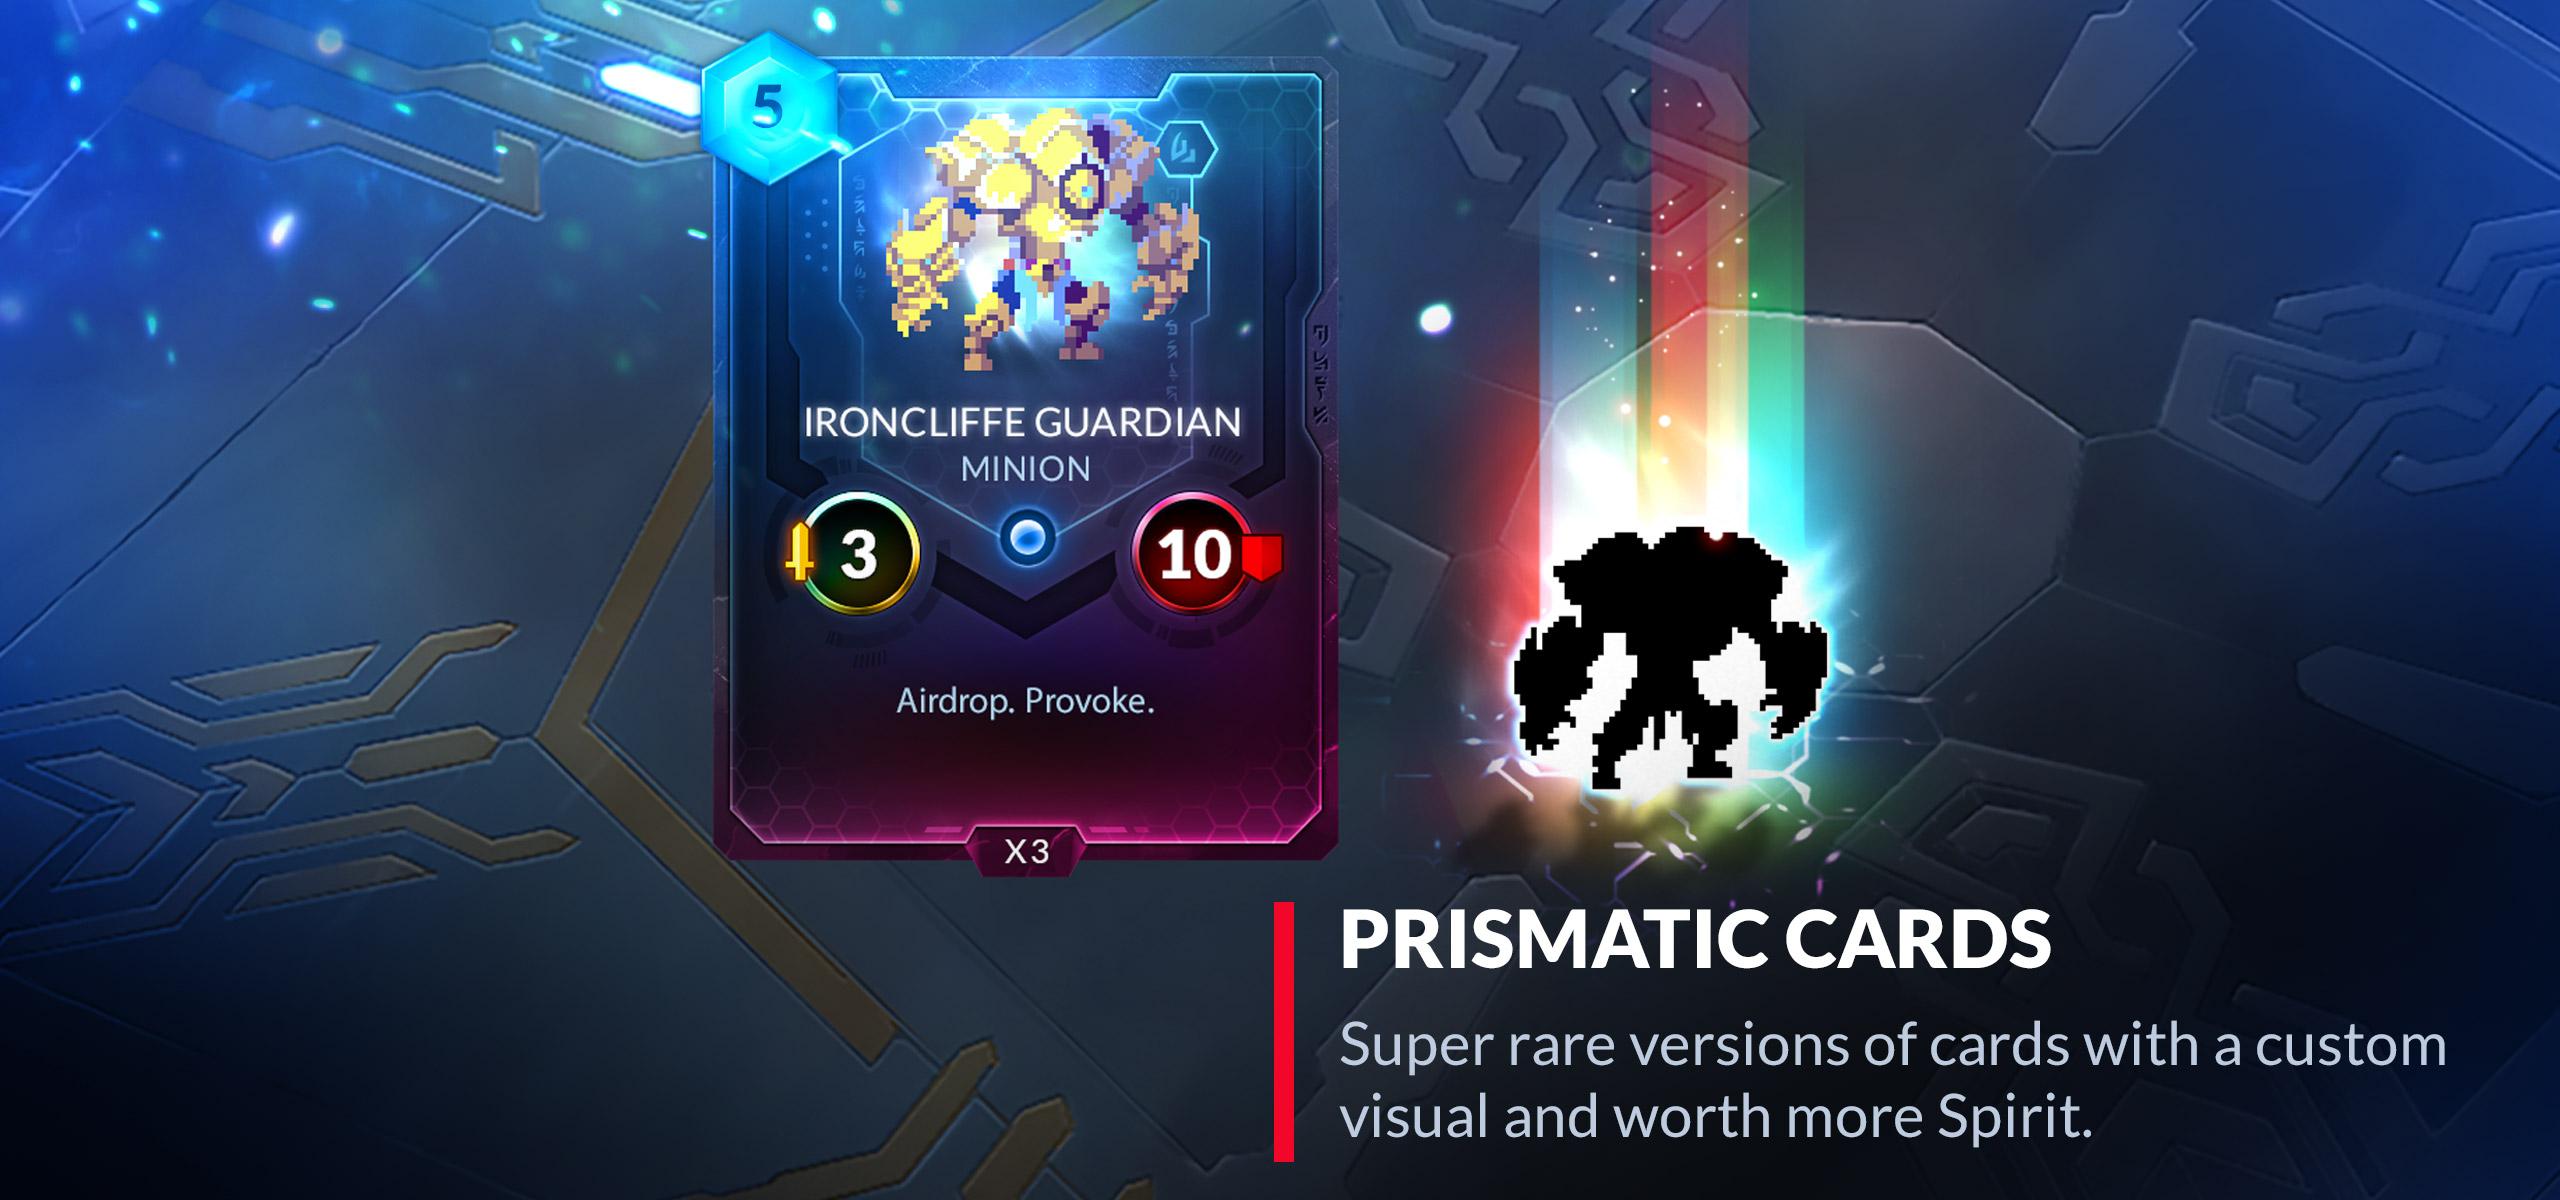 prismatic_cards